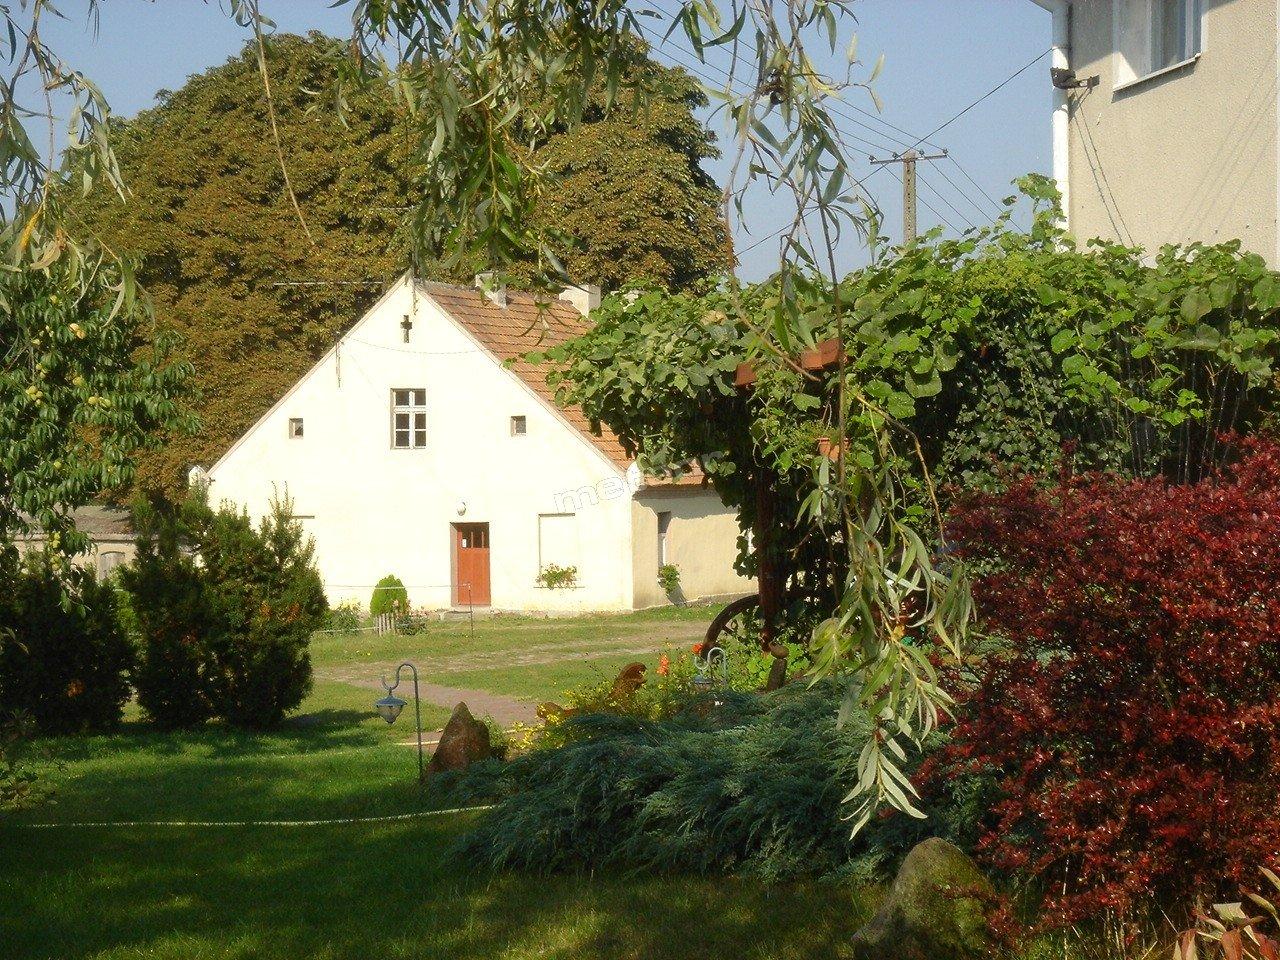 Gospodarstwo Agroturystyczne Dom Stara Chata